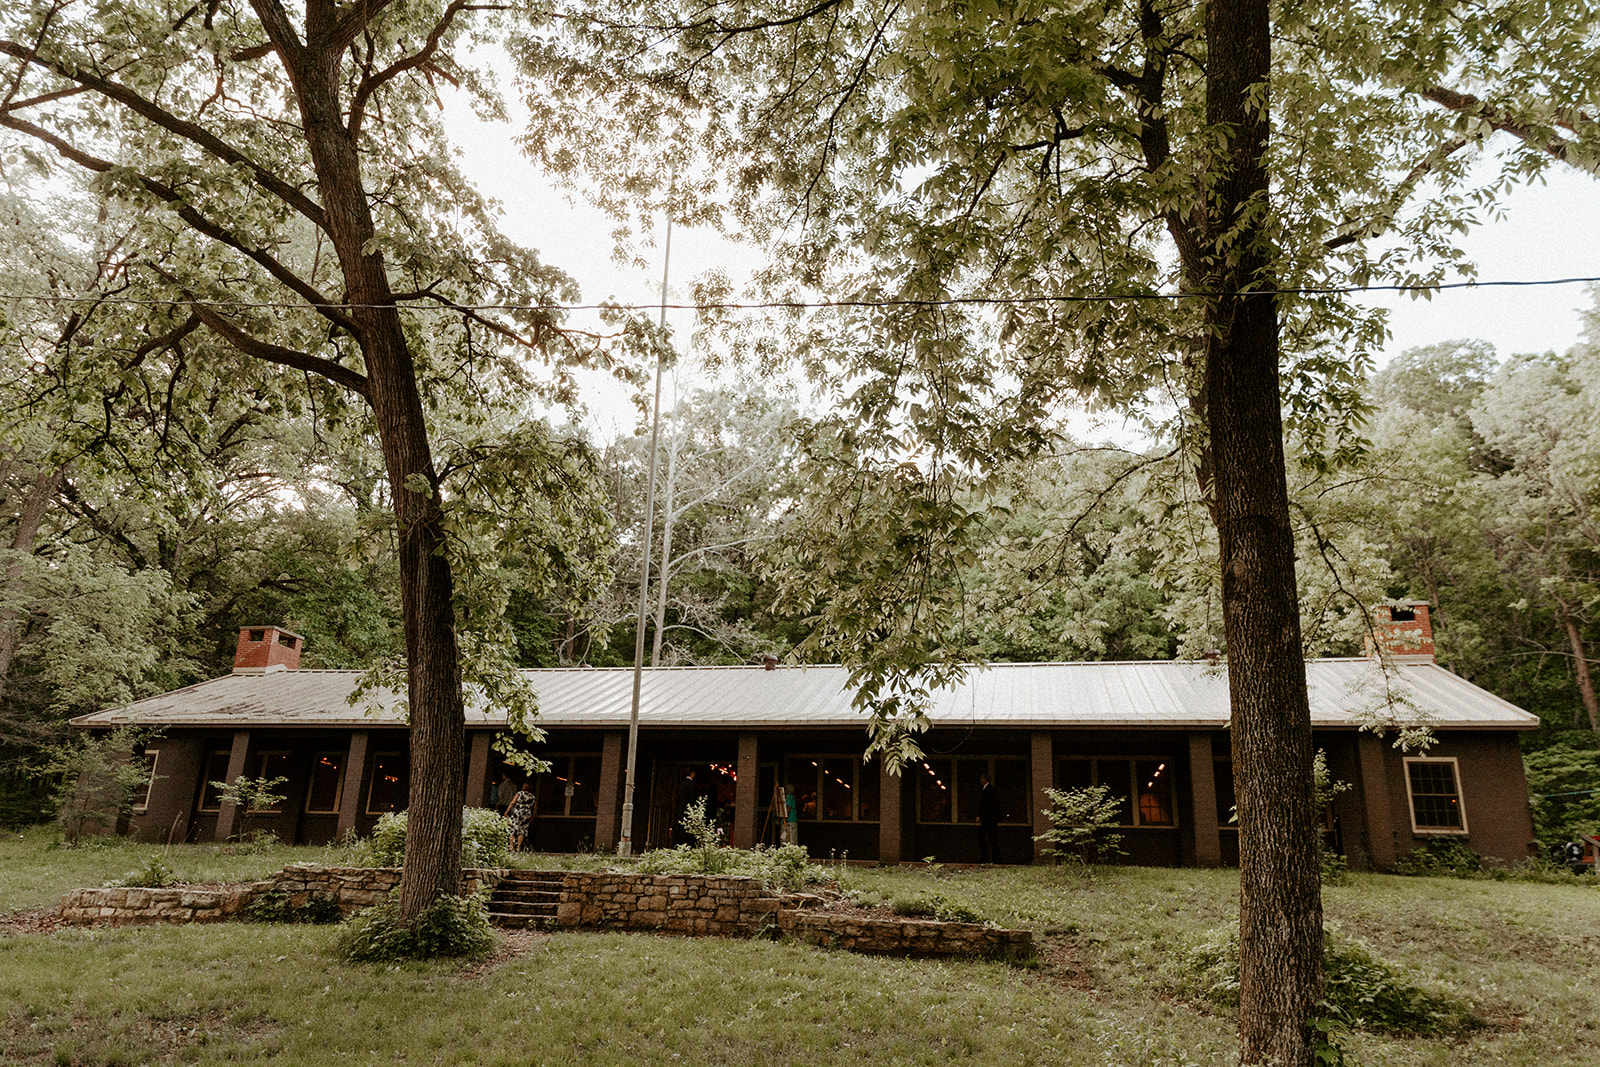 camp_wokanda_peoria_illinois_wedding_photographer_wright_photographs_bliese_0882.jpg